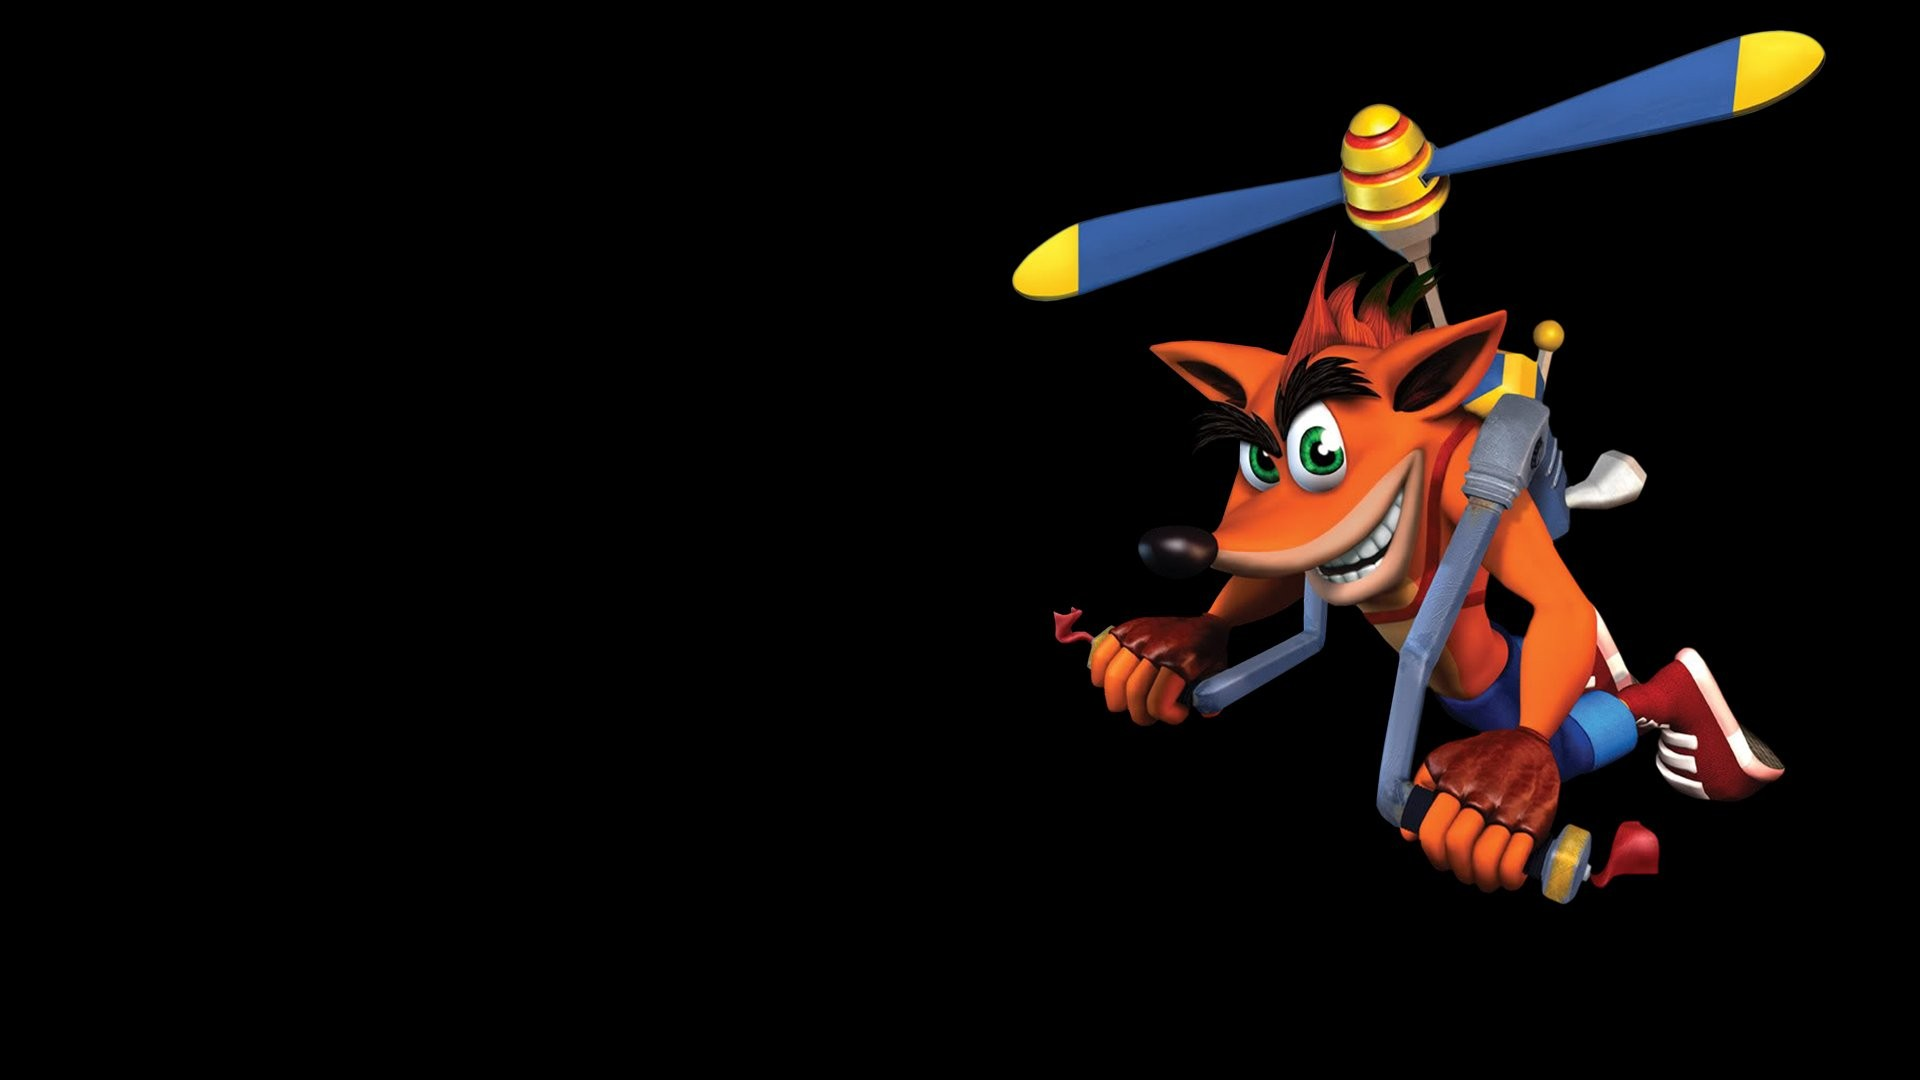 Crash Bandicoot Wallpaper ·① Download Free High Resolution